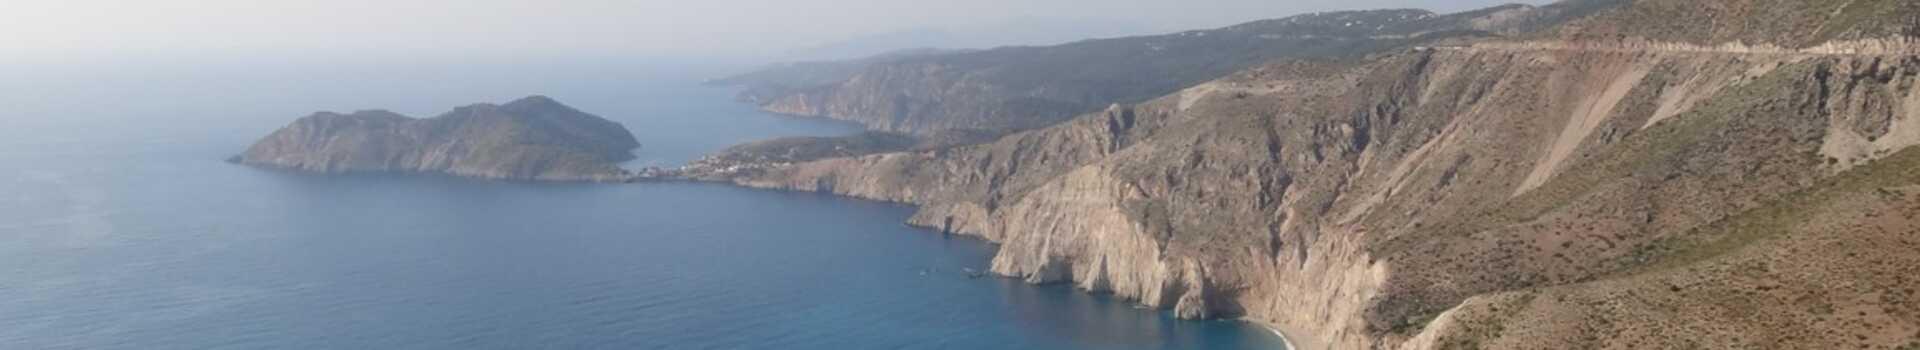 Řecko, Kefalonie, Assos (3)